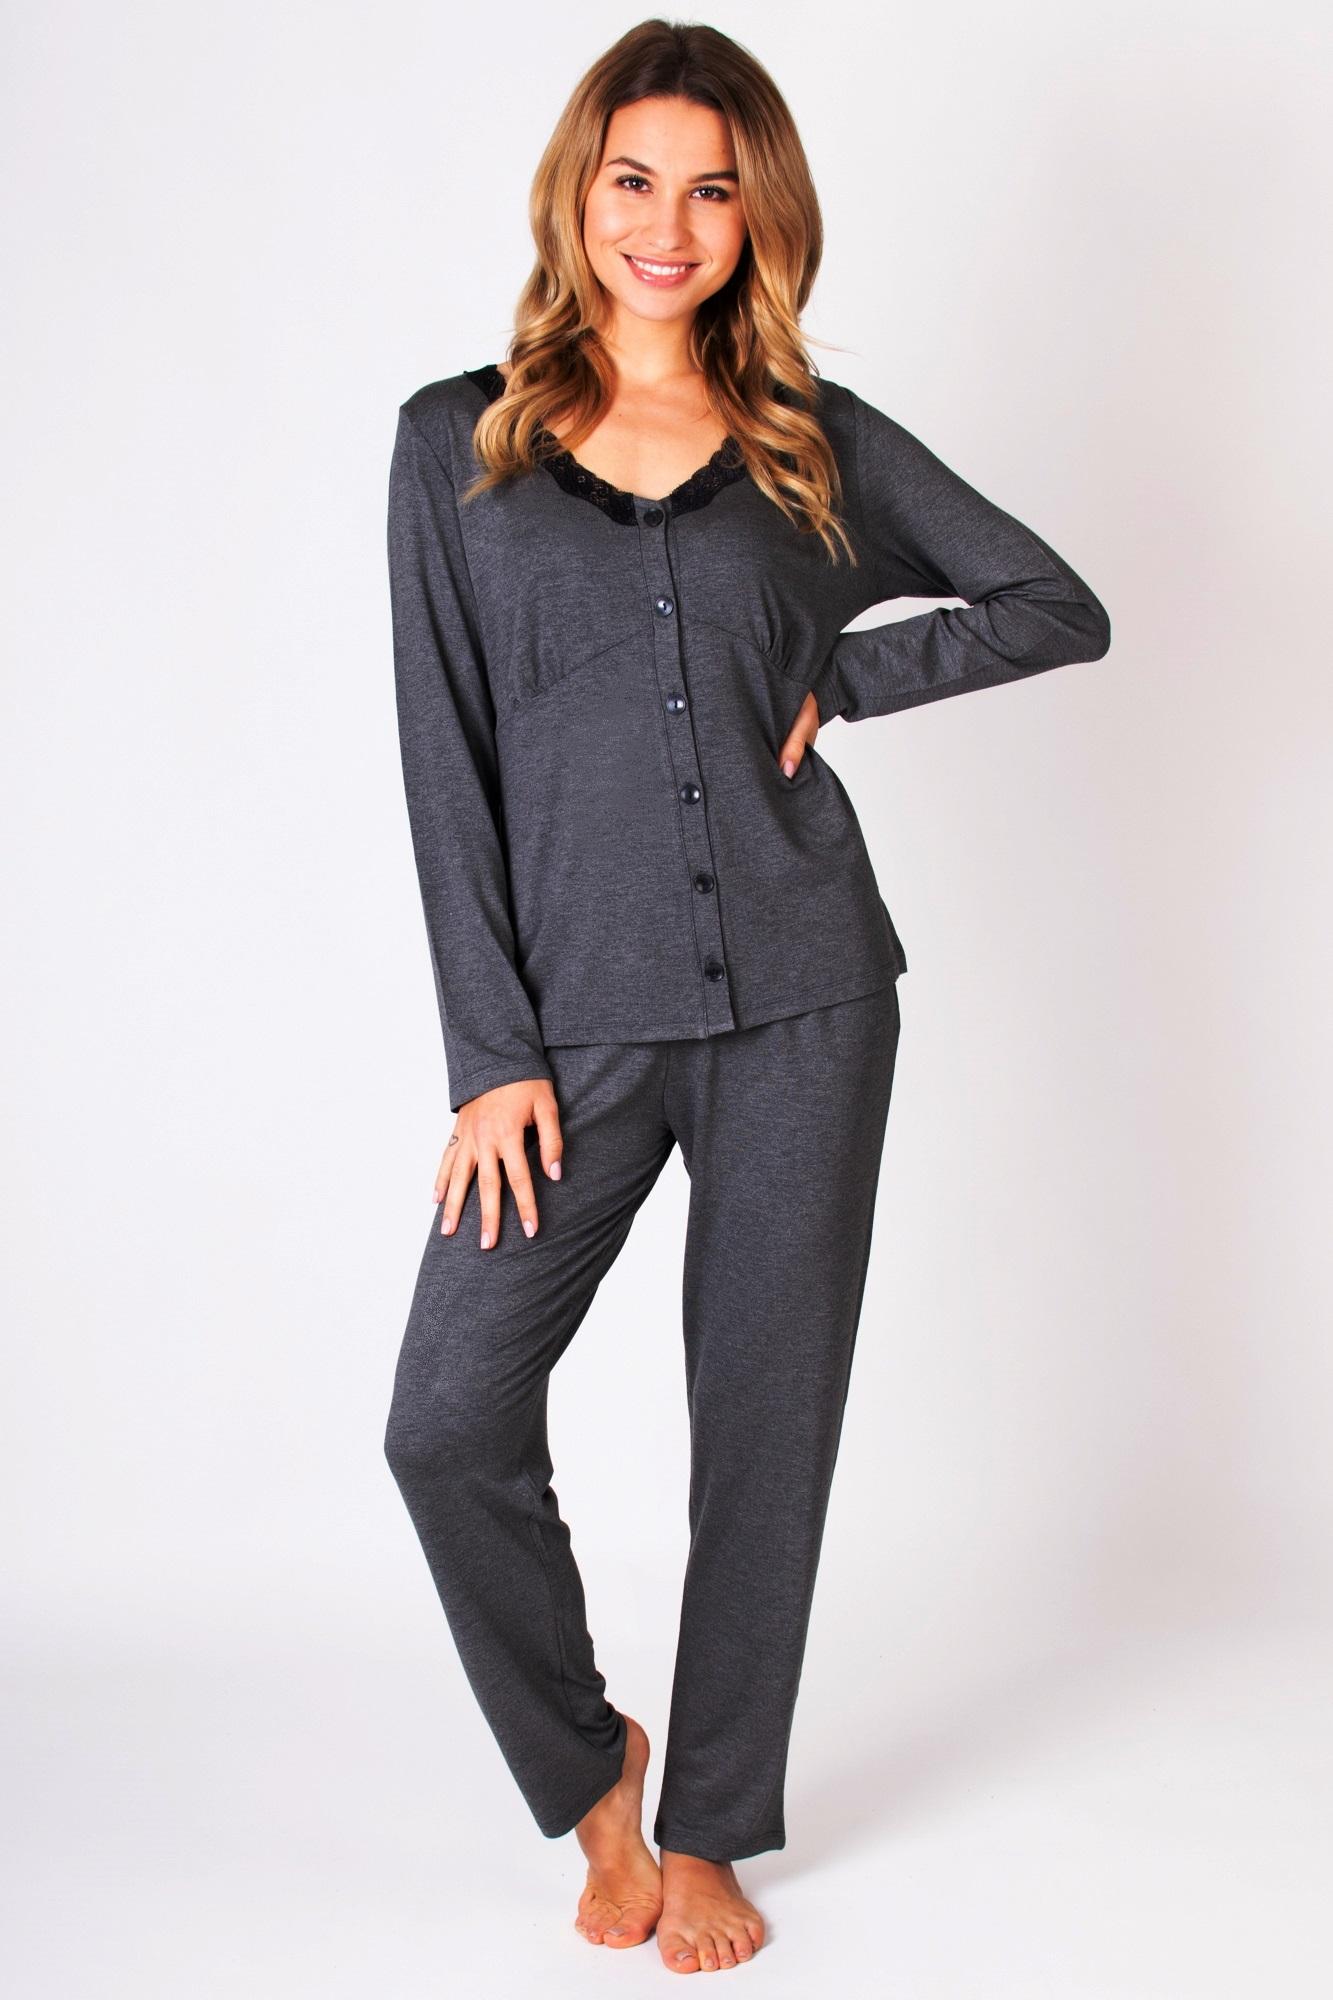 Pyžamo pro ženy Exclusive 1B1167